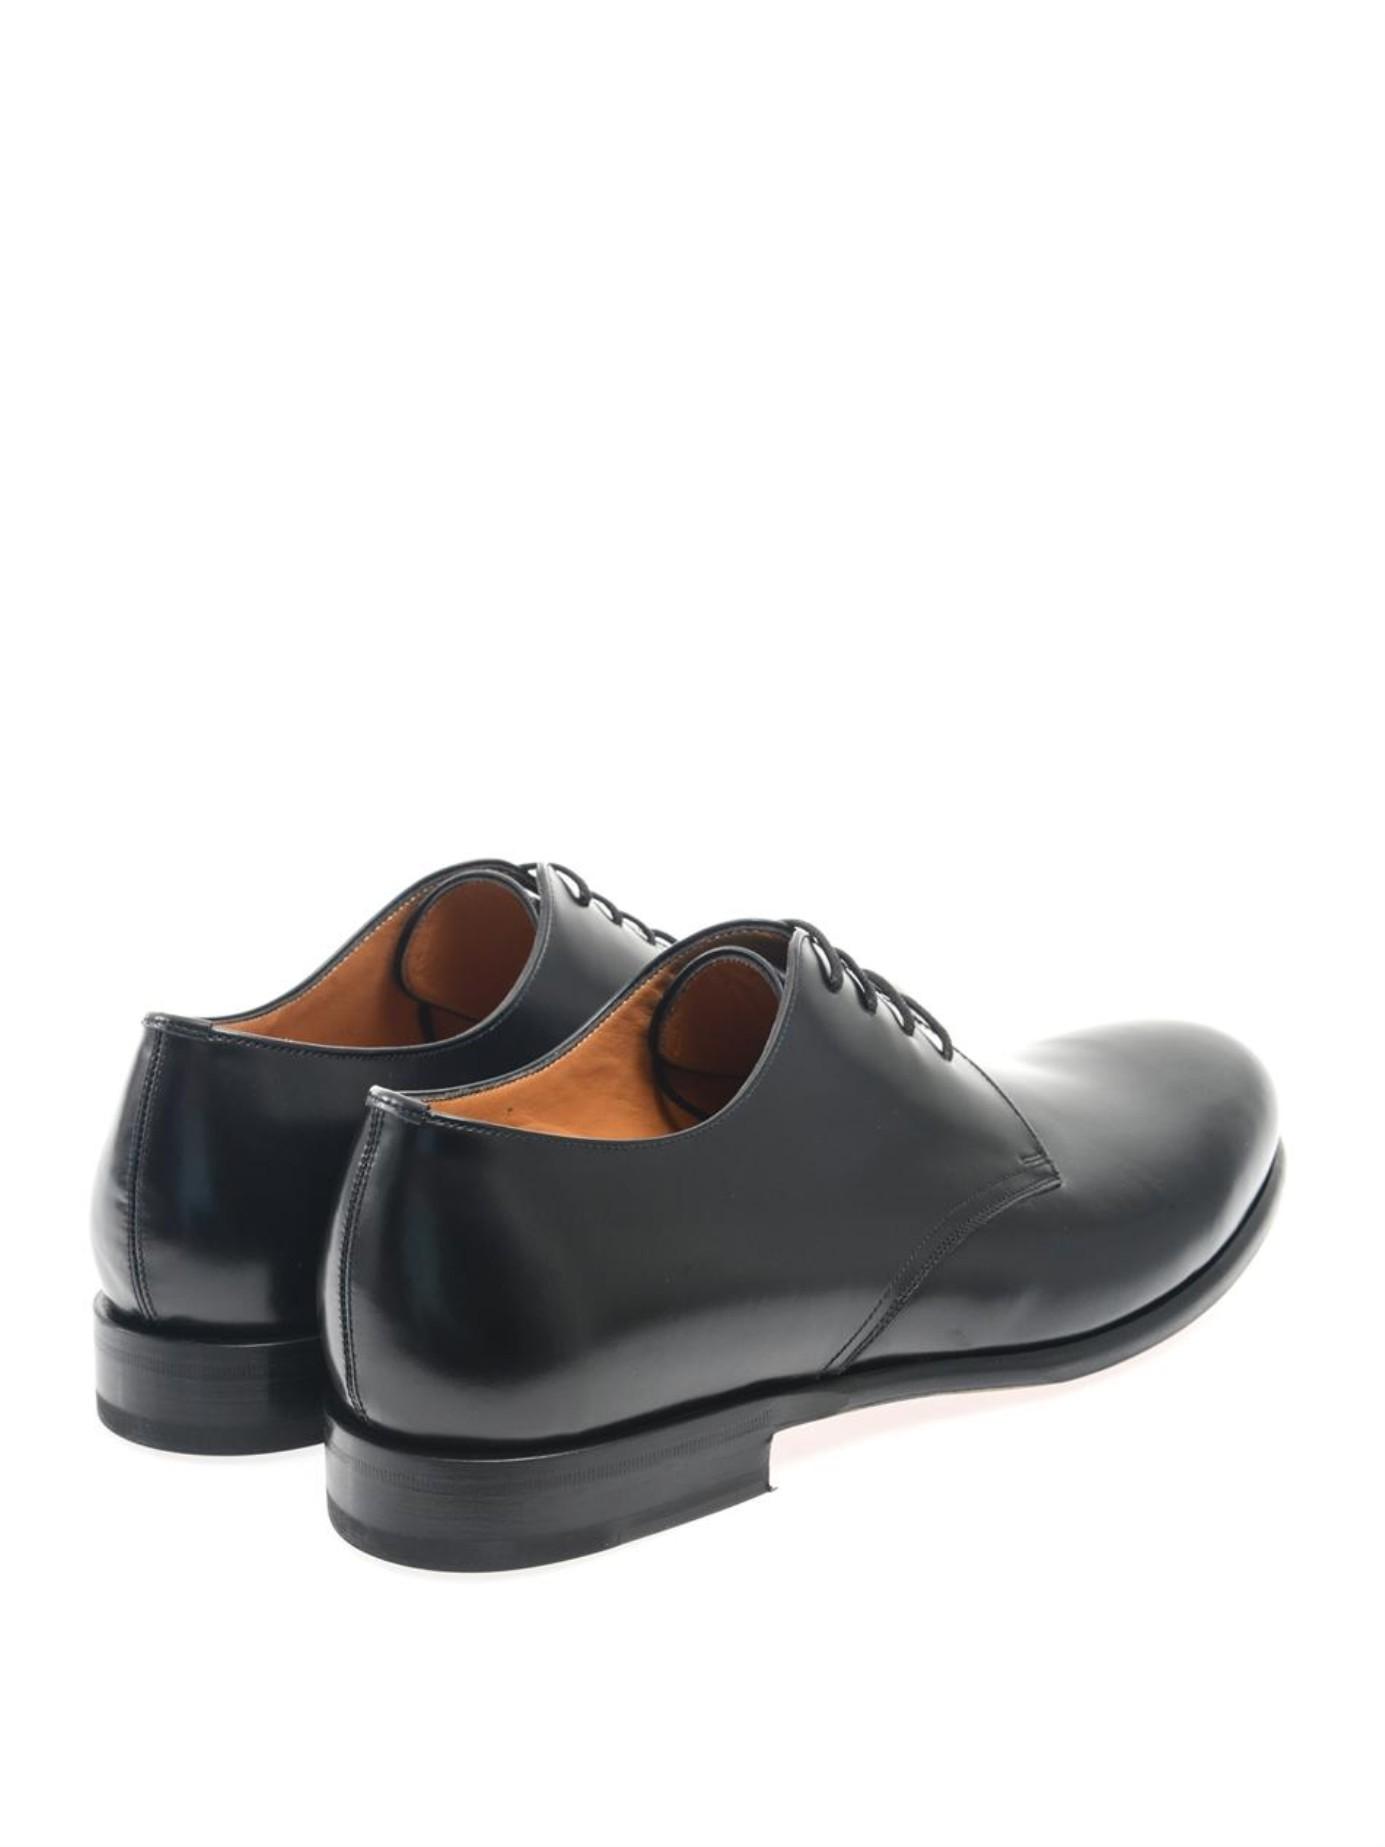 Cerruti 1881 Derby shoes discount release dates buy cheap affordable outlet store sale online 73F4hiPQx